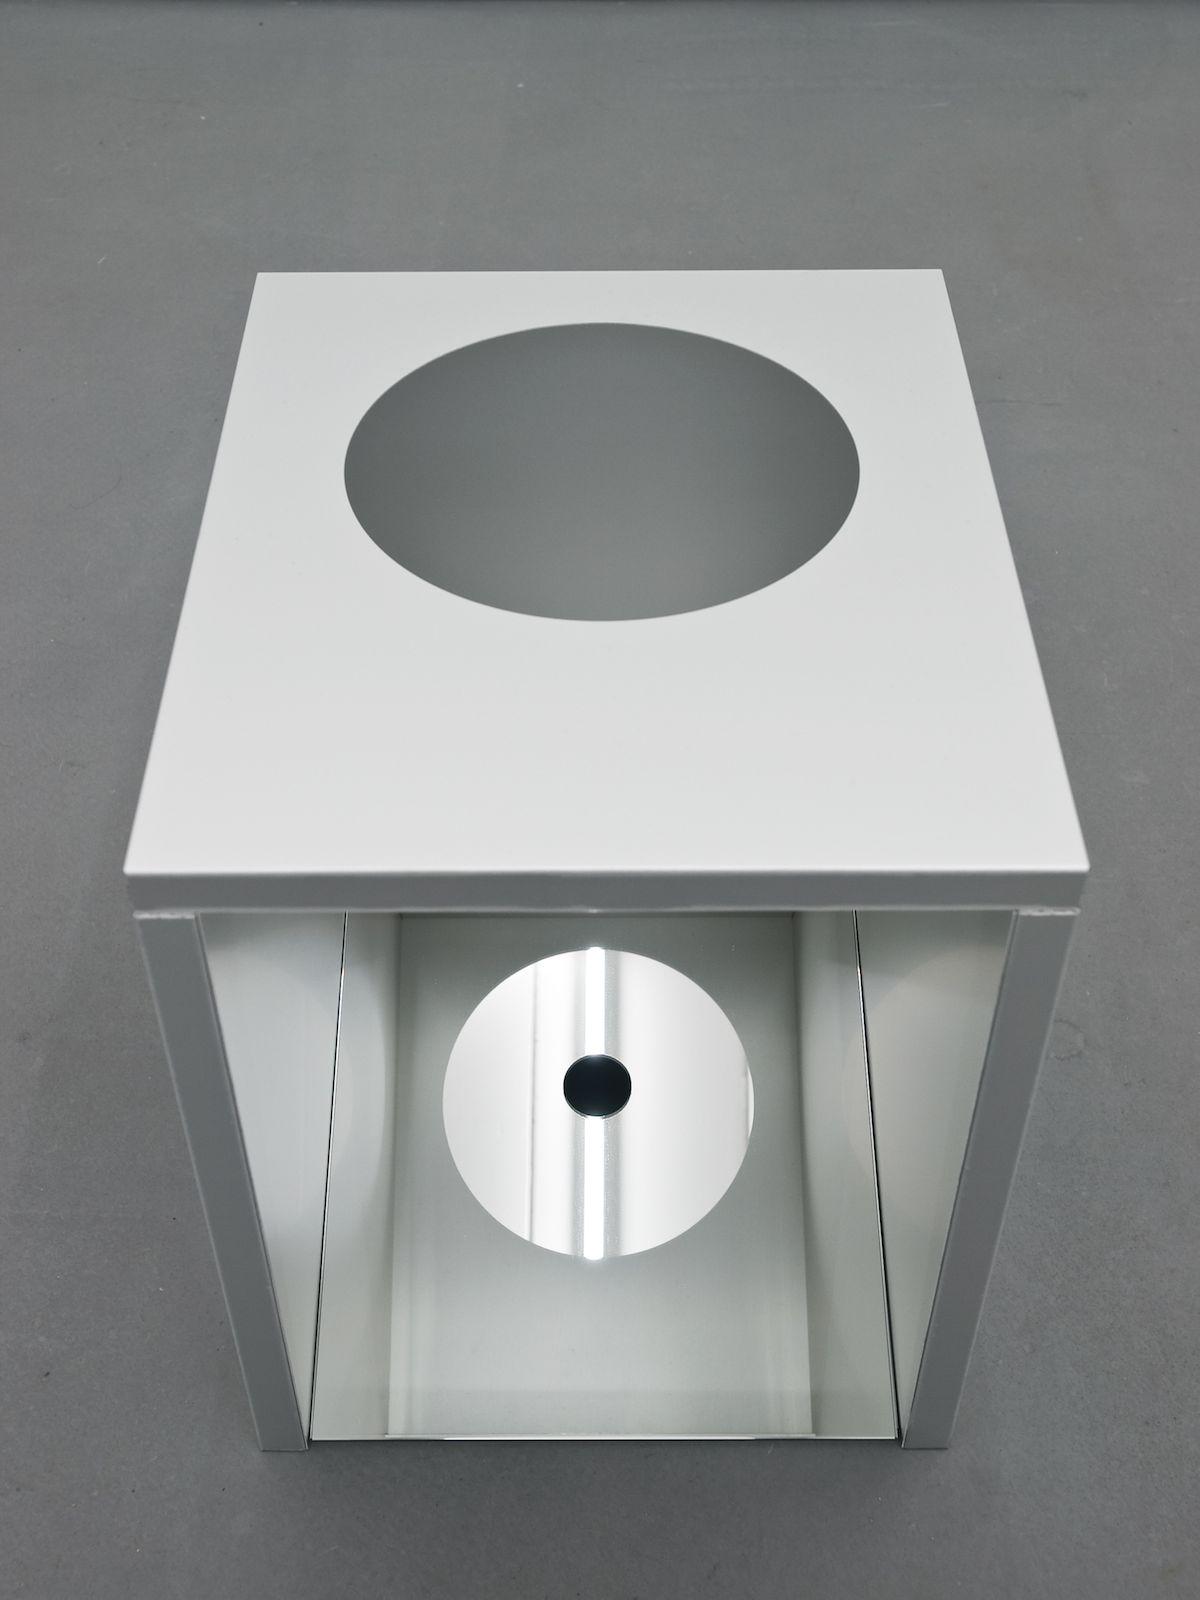 Brazilian wax, 2010, aluminium, mirror, 45 x 37 x 45 cm